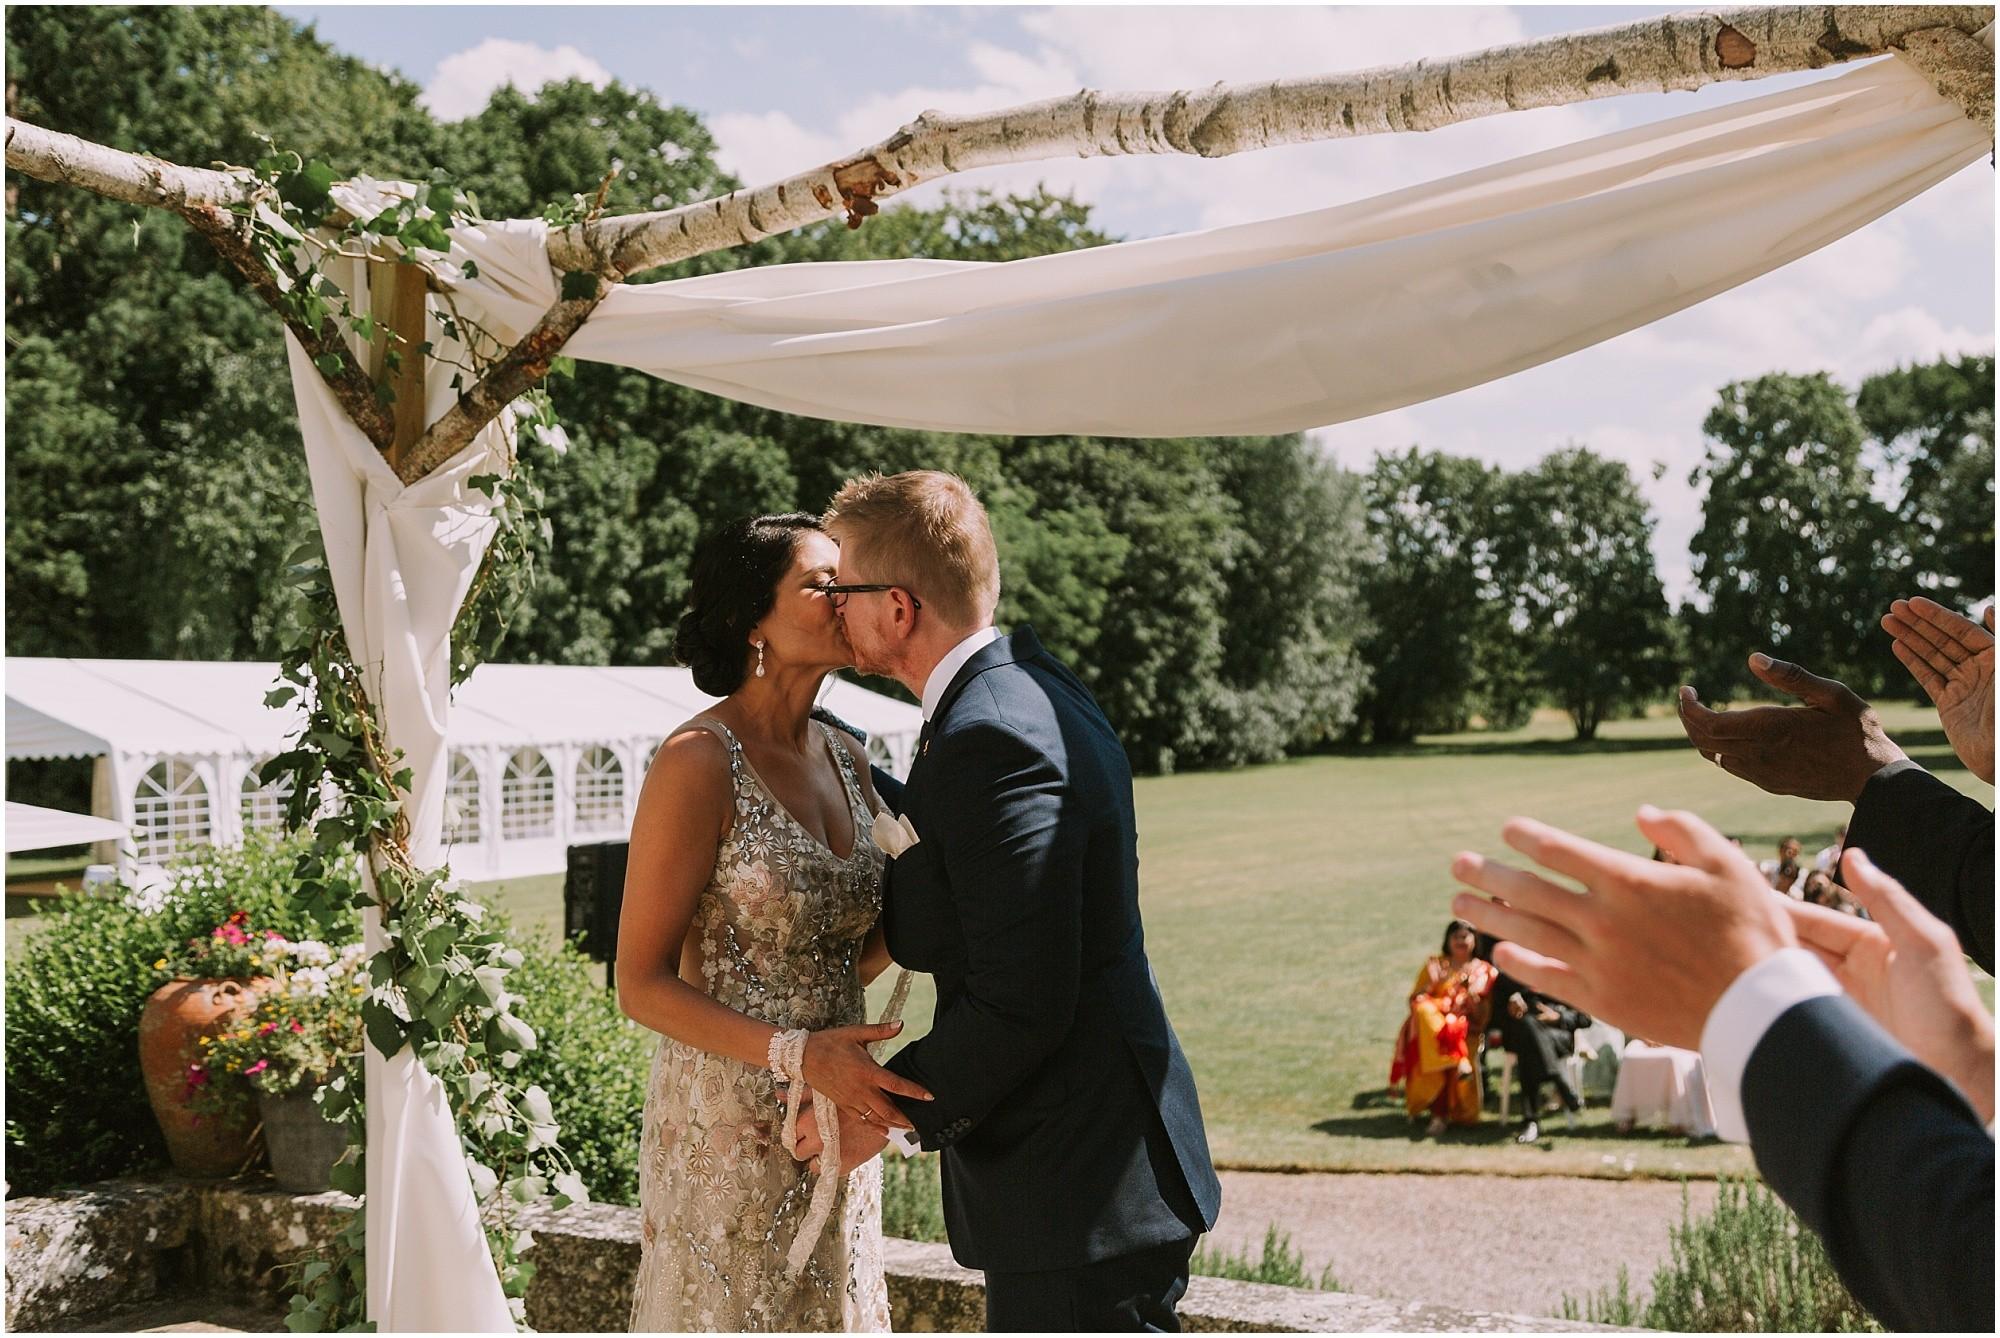 Kateryna-photos-photographer-mariage-chateau-saint-paterne-alencon-normandie-mayenne-le-mans_0085.jpg